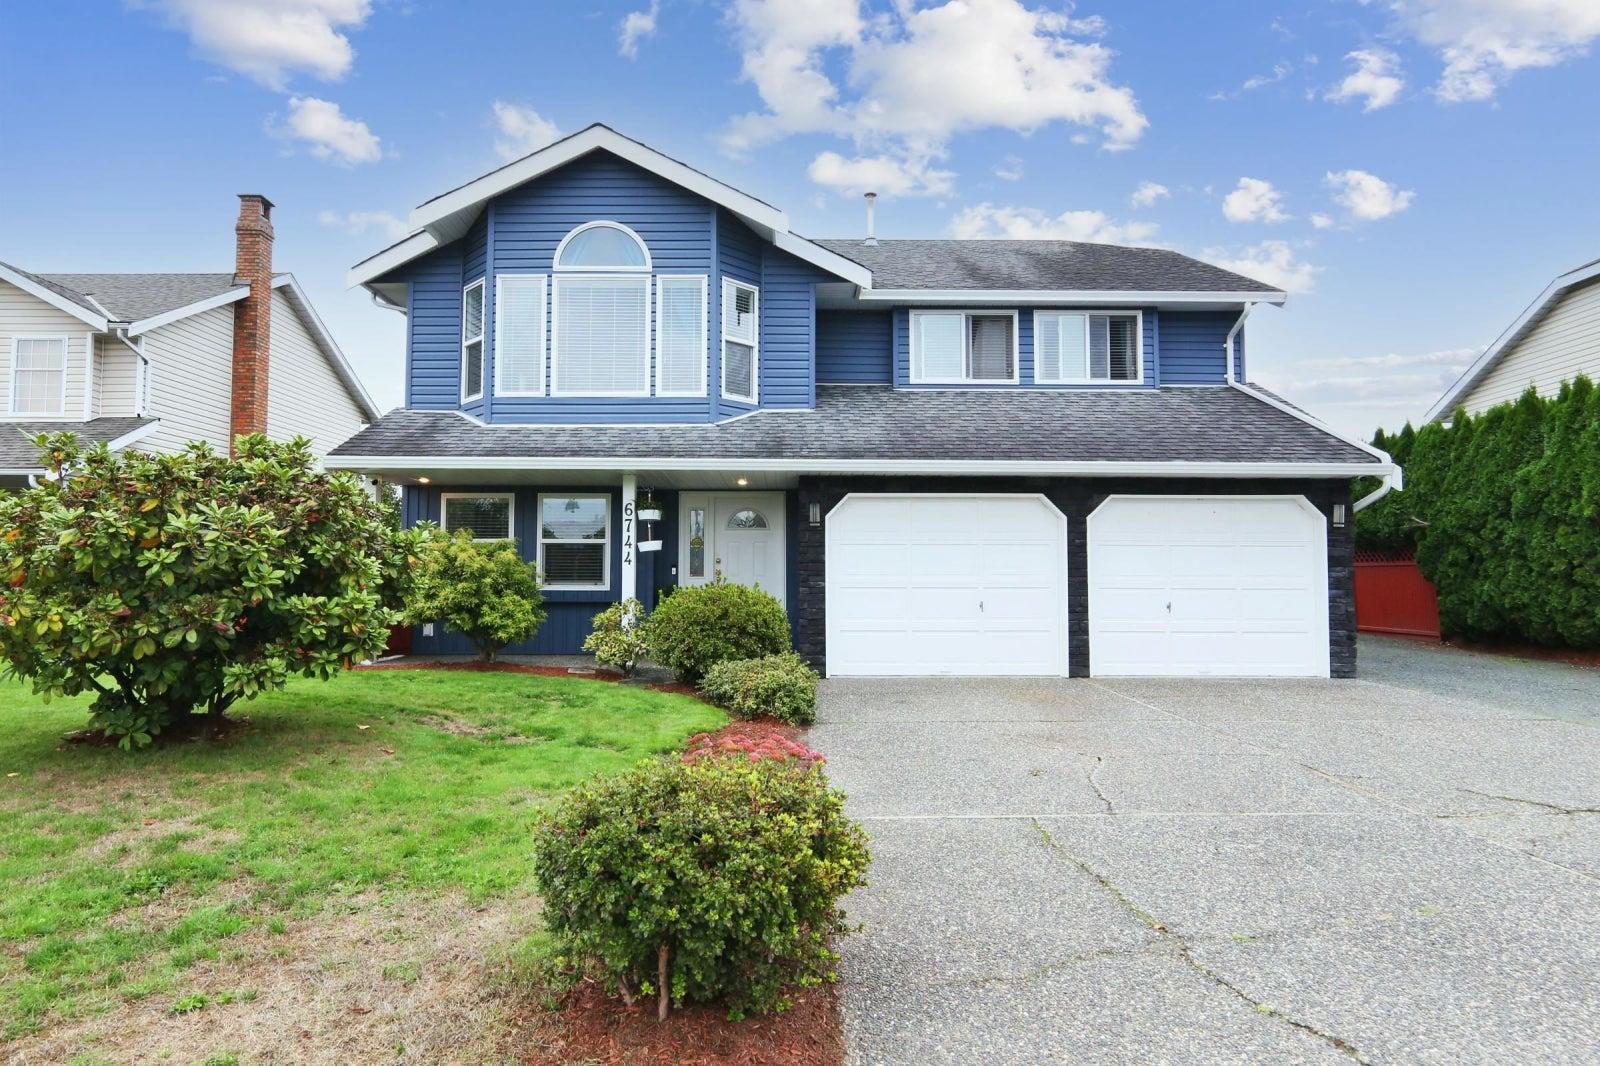 6744 VANMAR STREET - Sardis East Vedder Rd House/Single Family for sale, 4 Bedrooms (R2627057)